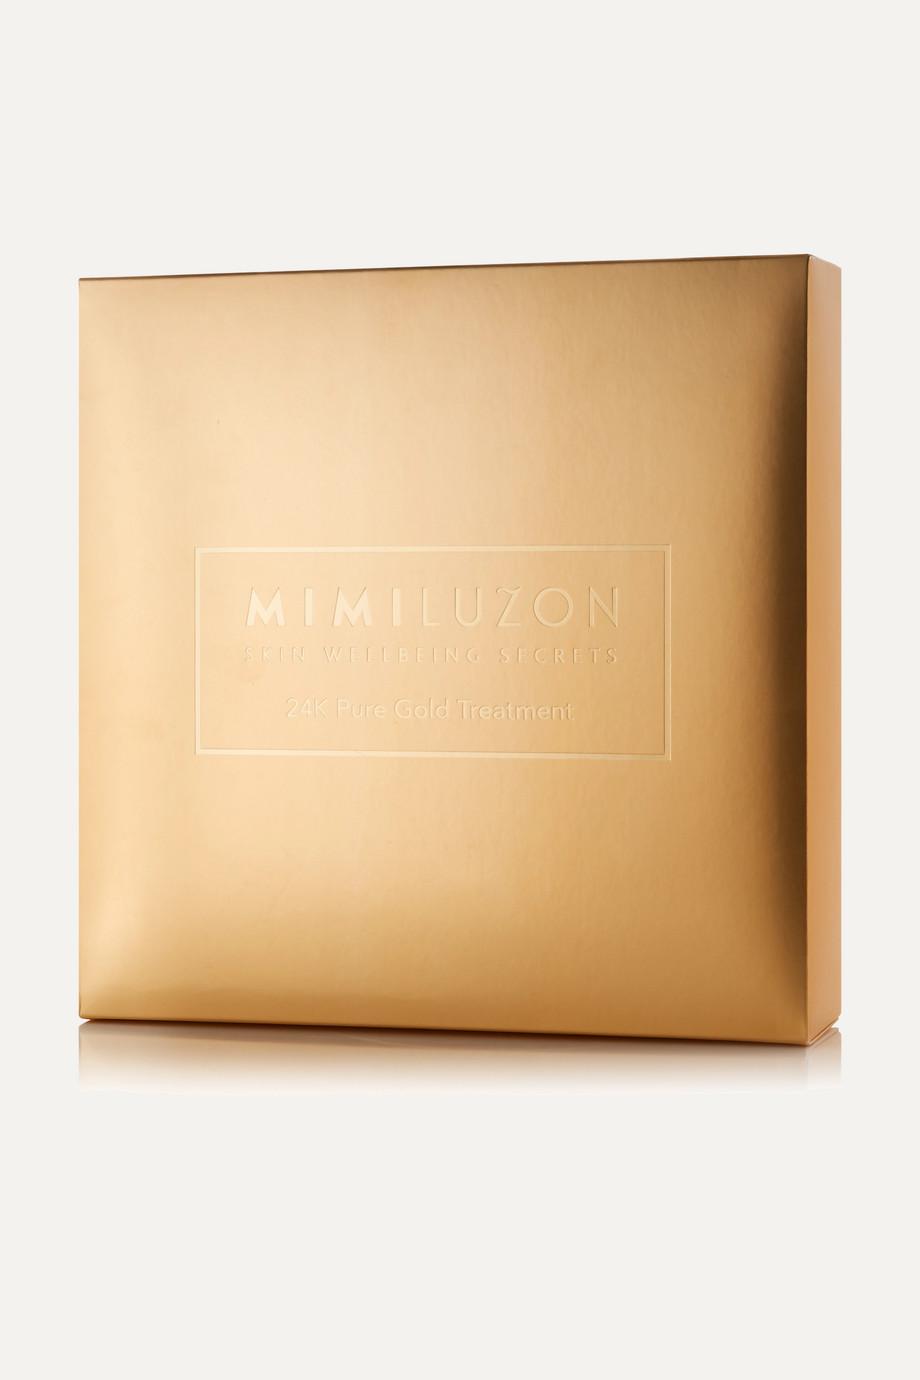 Mimi Luzon 24K Pure Gold Treatment